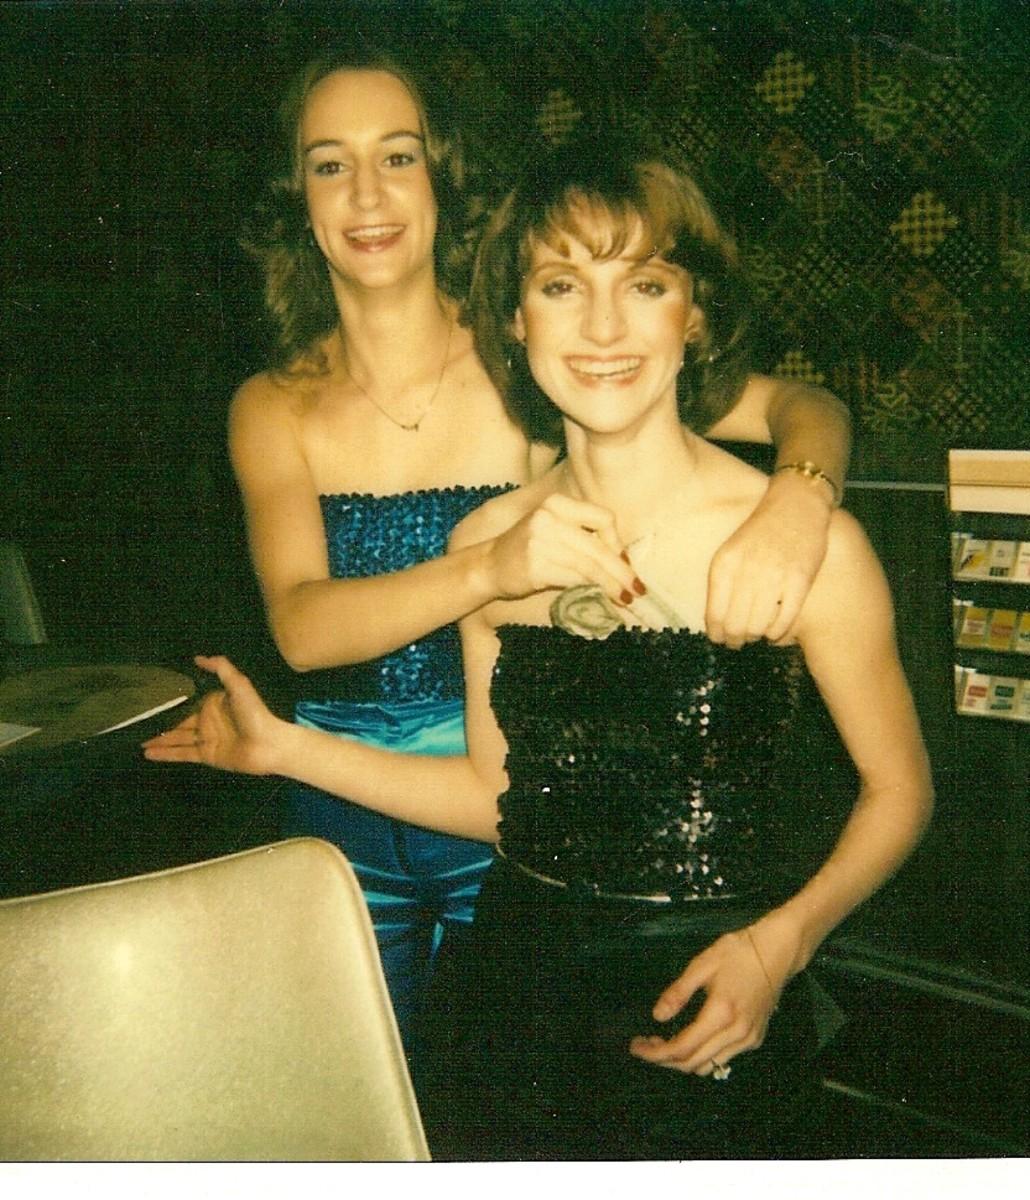 Me & Jennifer, friends since 1975.